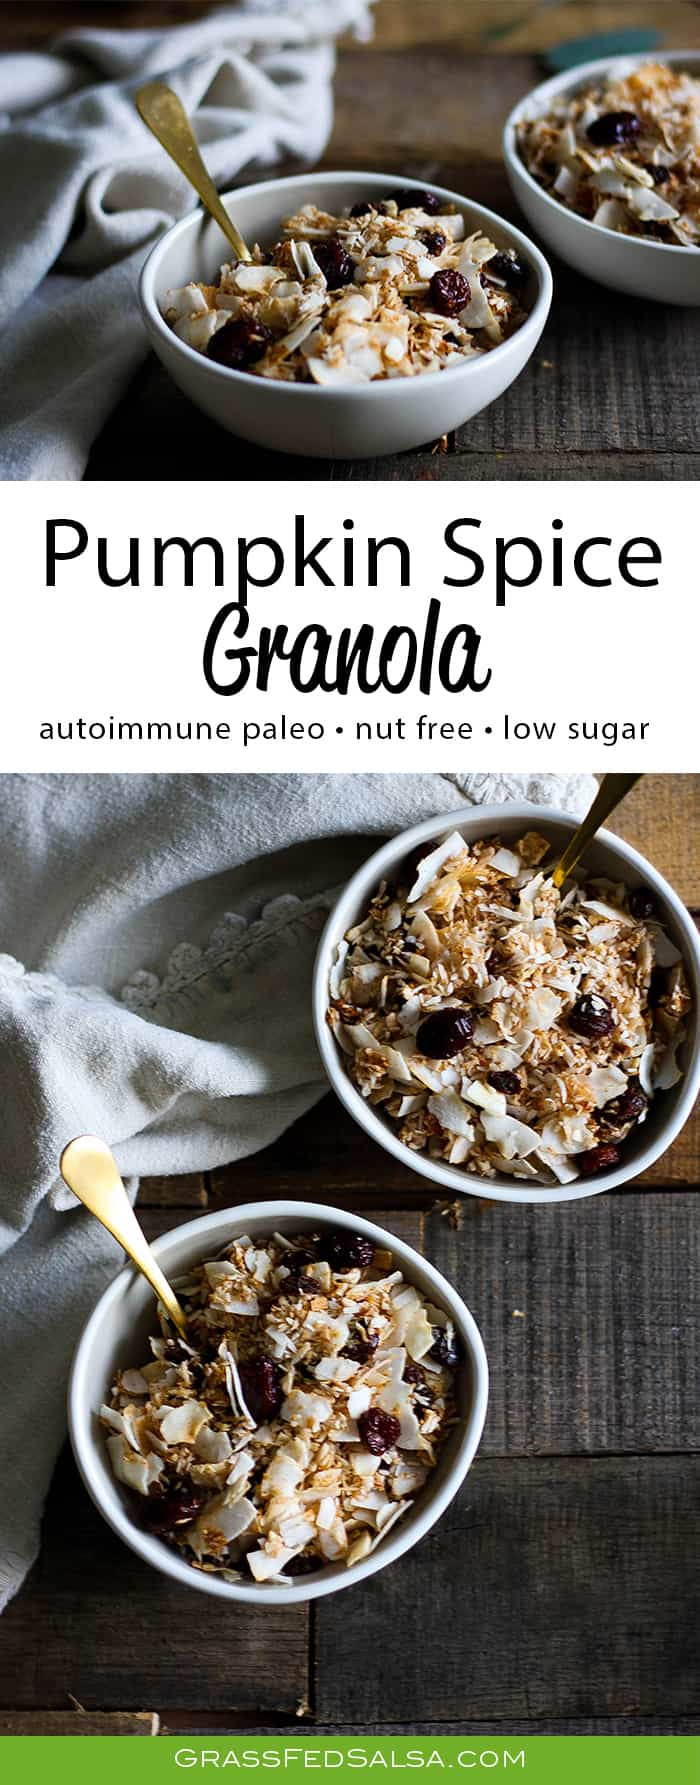 AIP Pumpkin Spice Granola Cereal